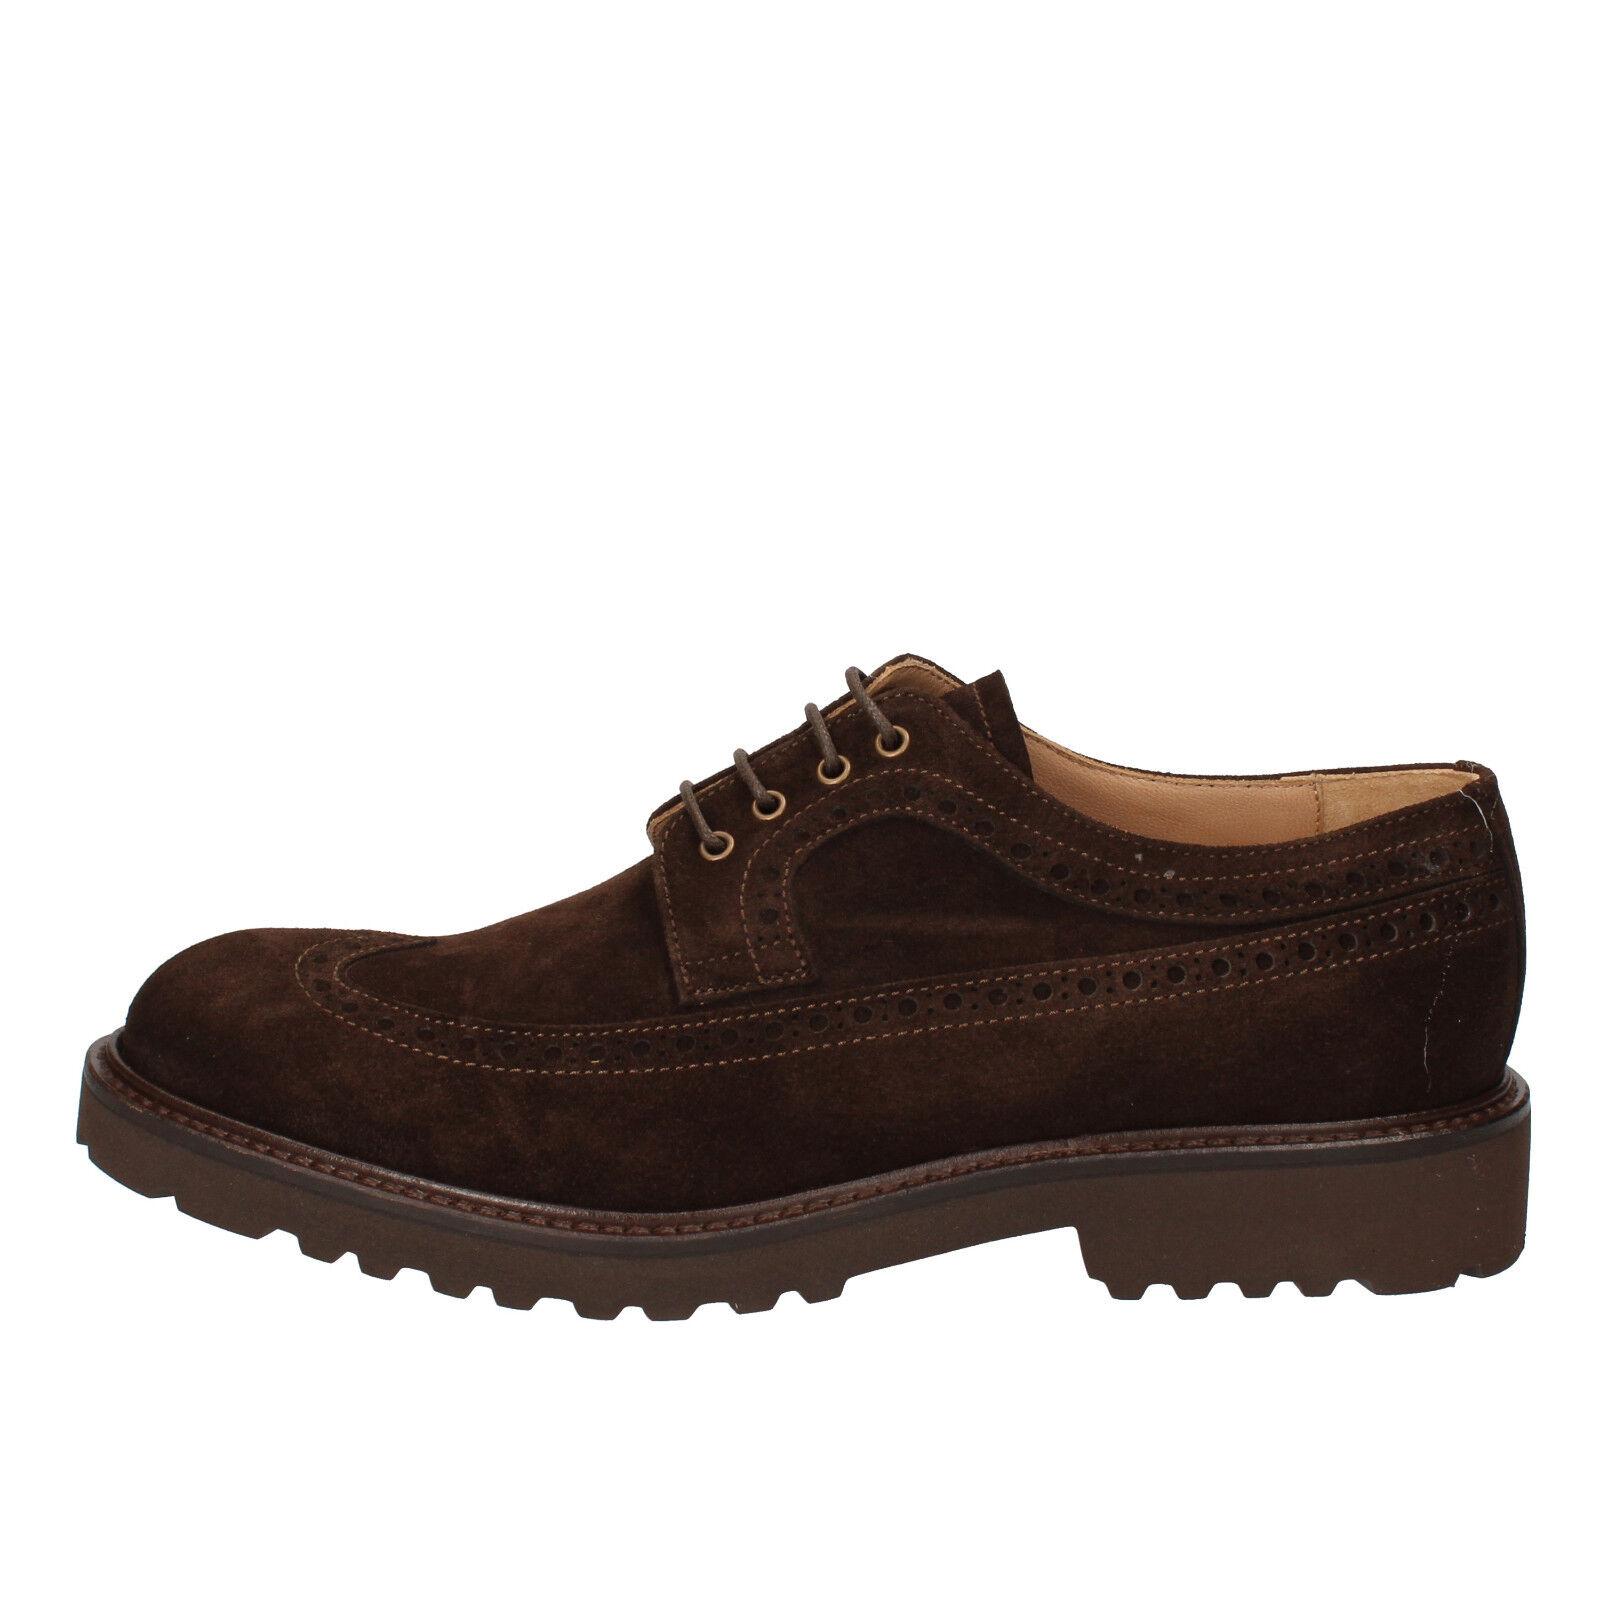 mens shoes EVOLUZION 6 () elegant / oxford-shoes brown suede AD261-B